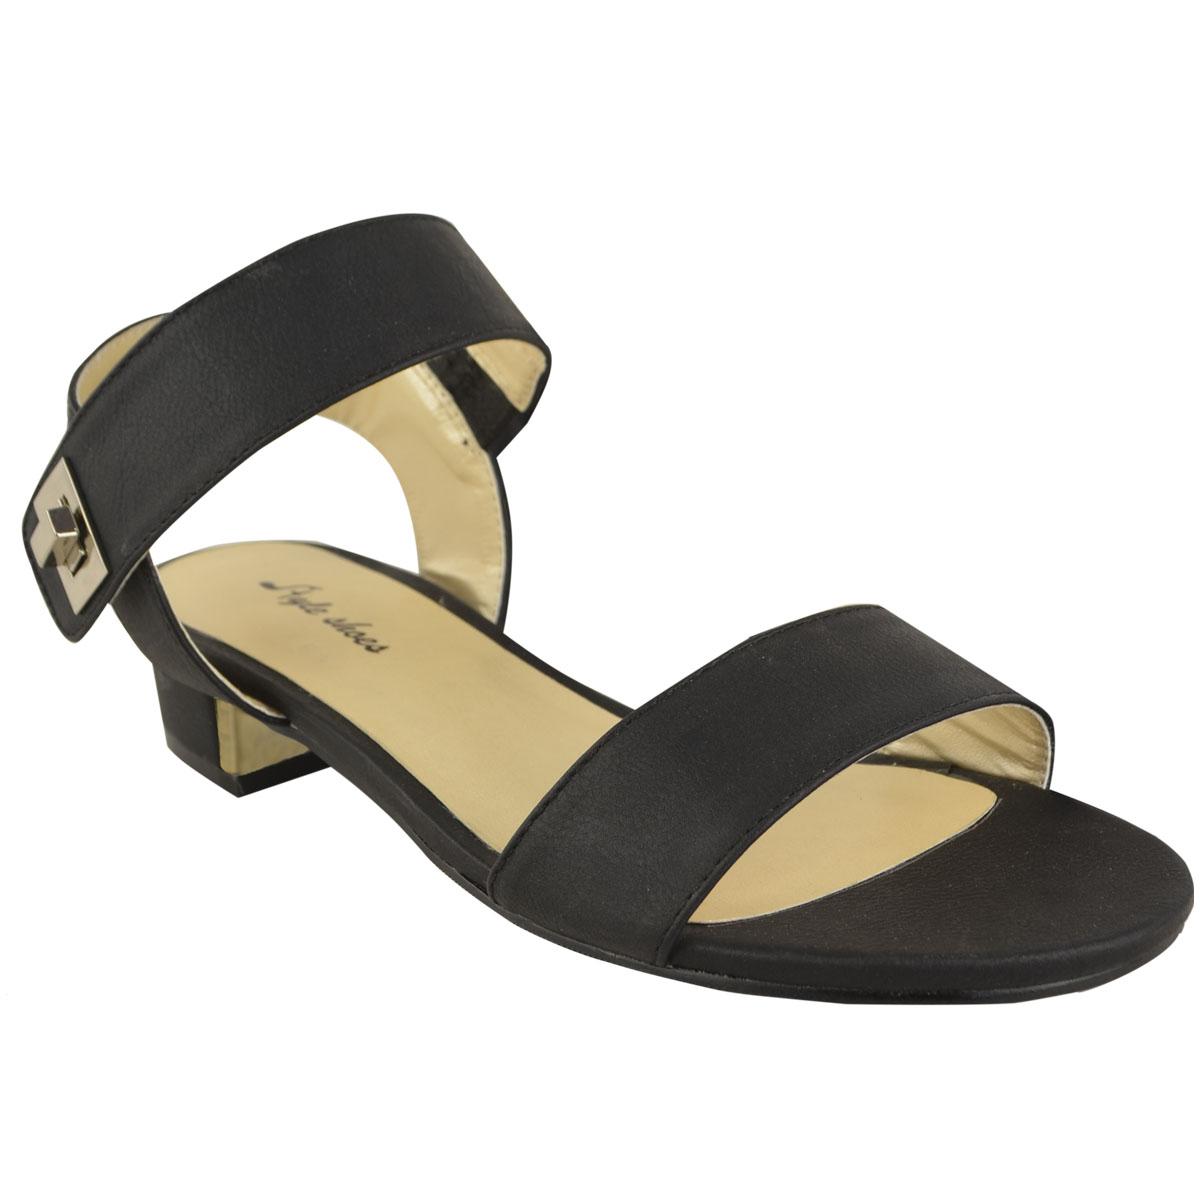 Flat heel sandals images - Womens Ladies Low Block Heel Sandals Summer Ankle